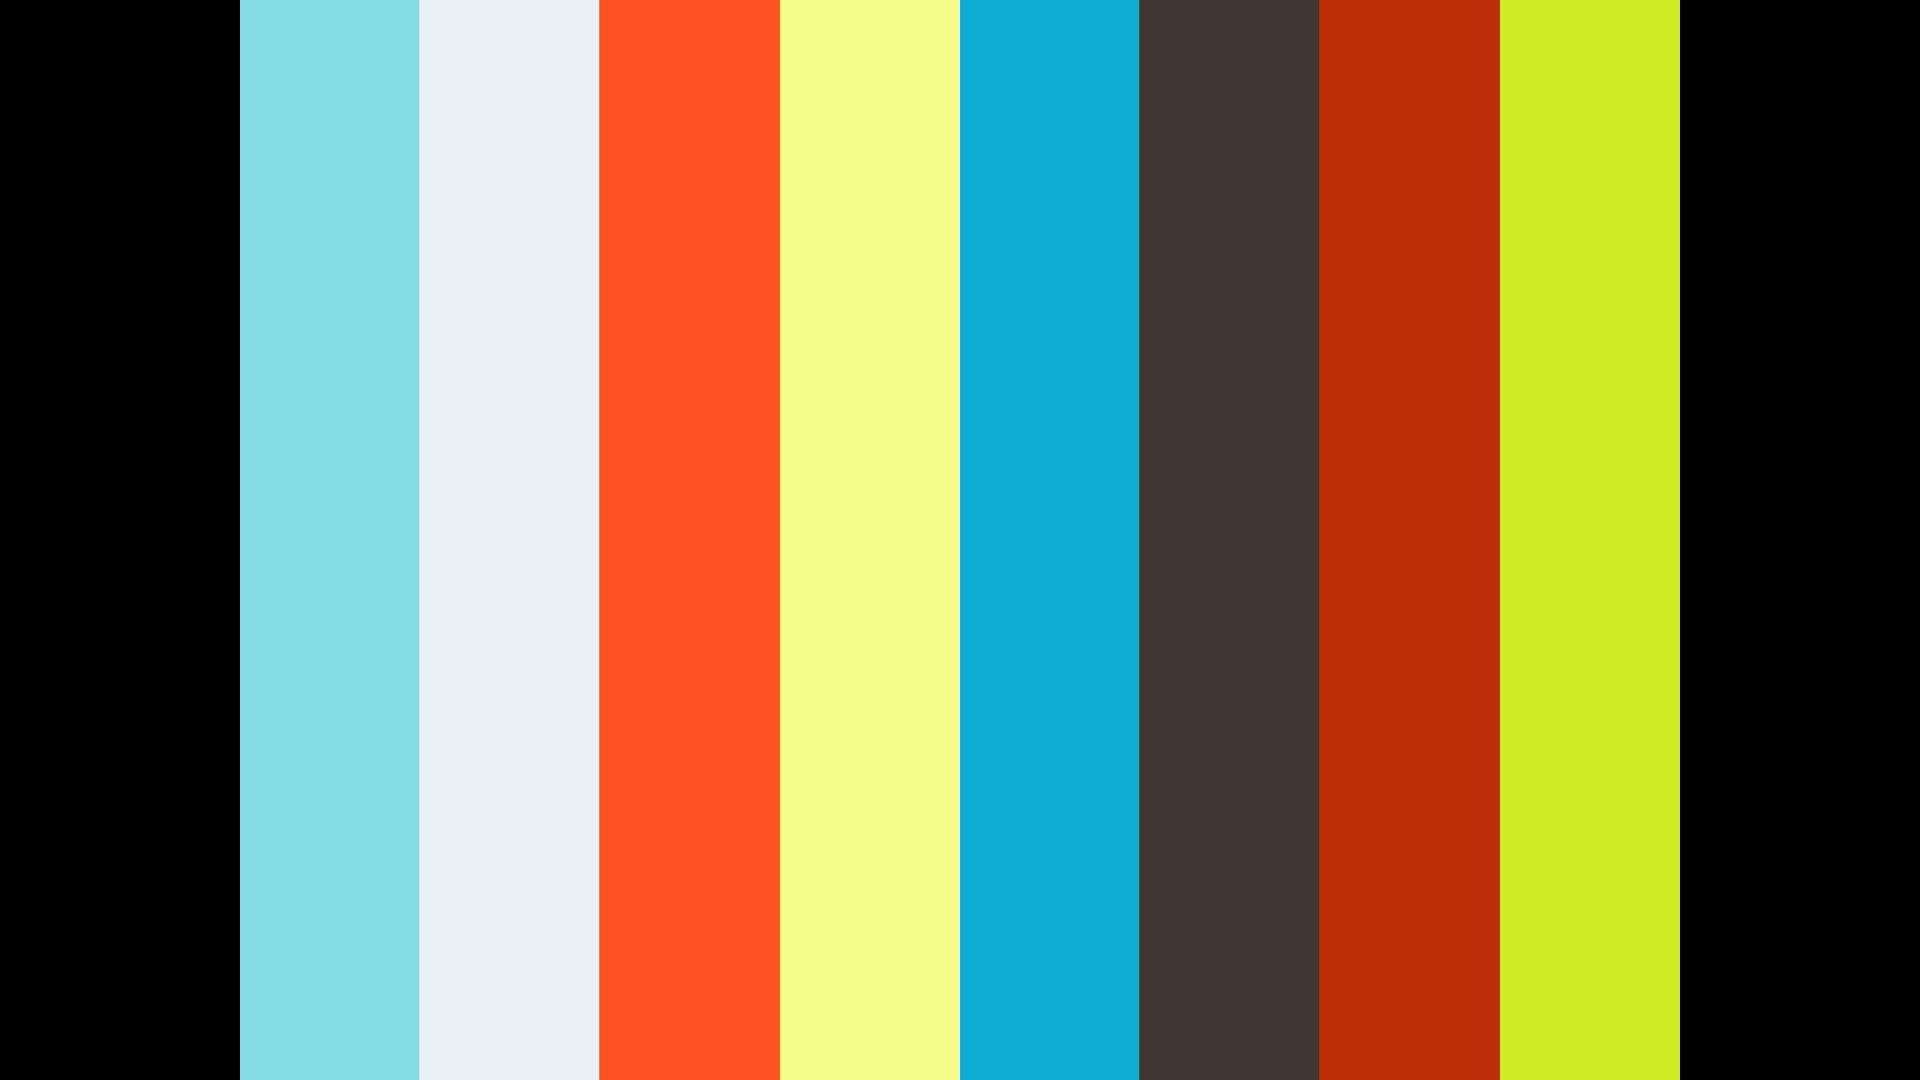 Ars Nova's 2017_18 Lineup is Here!